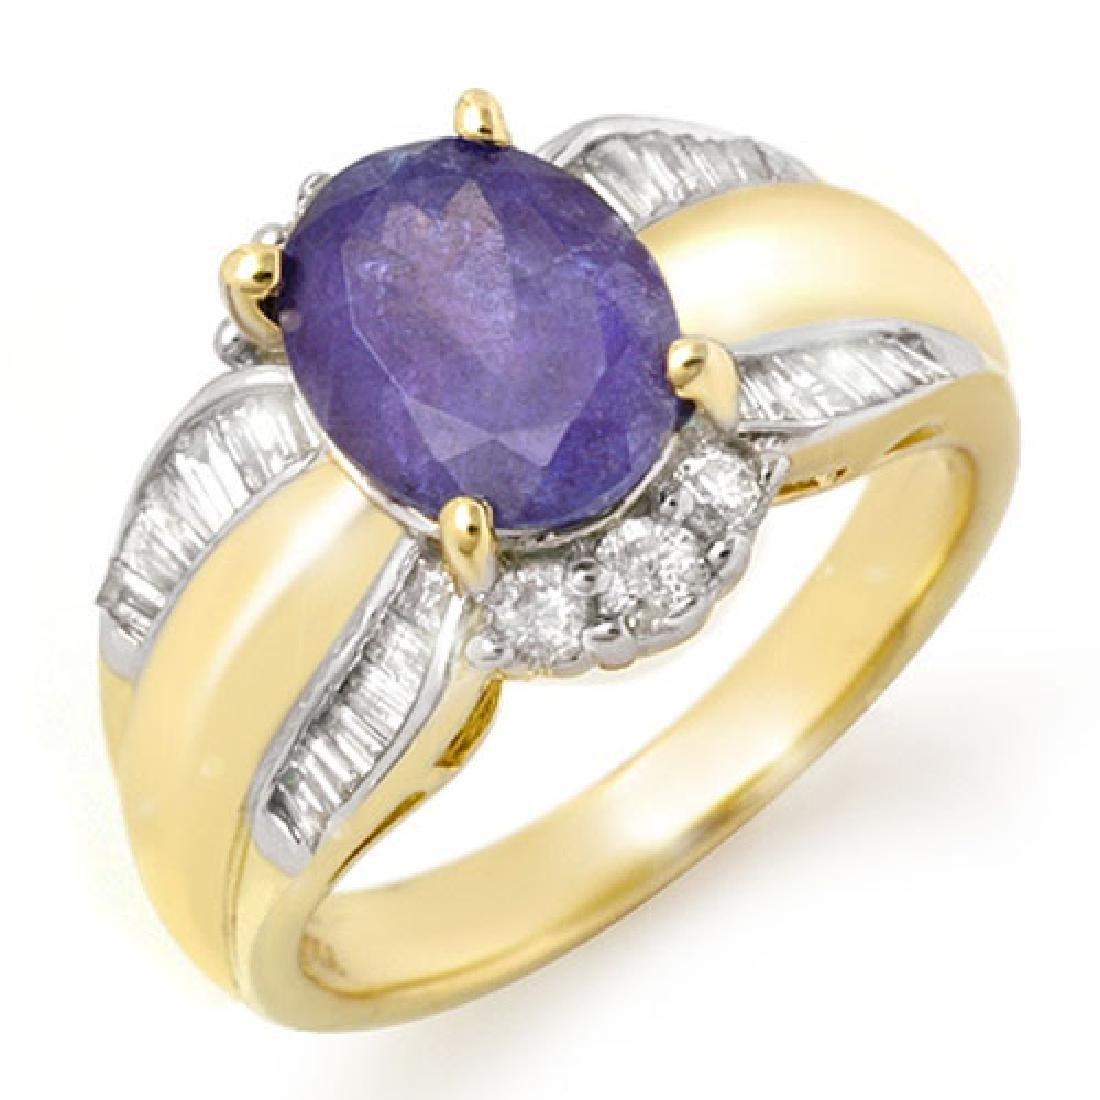 3.52 CTW Tanzanite & Diamond Ring 14K Yellow Gold